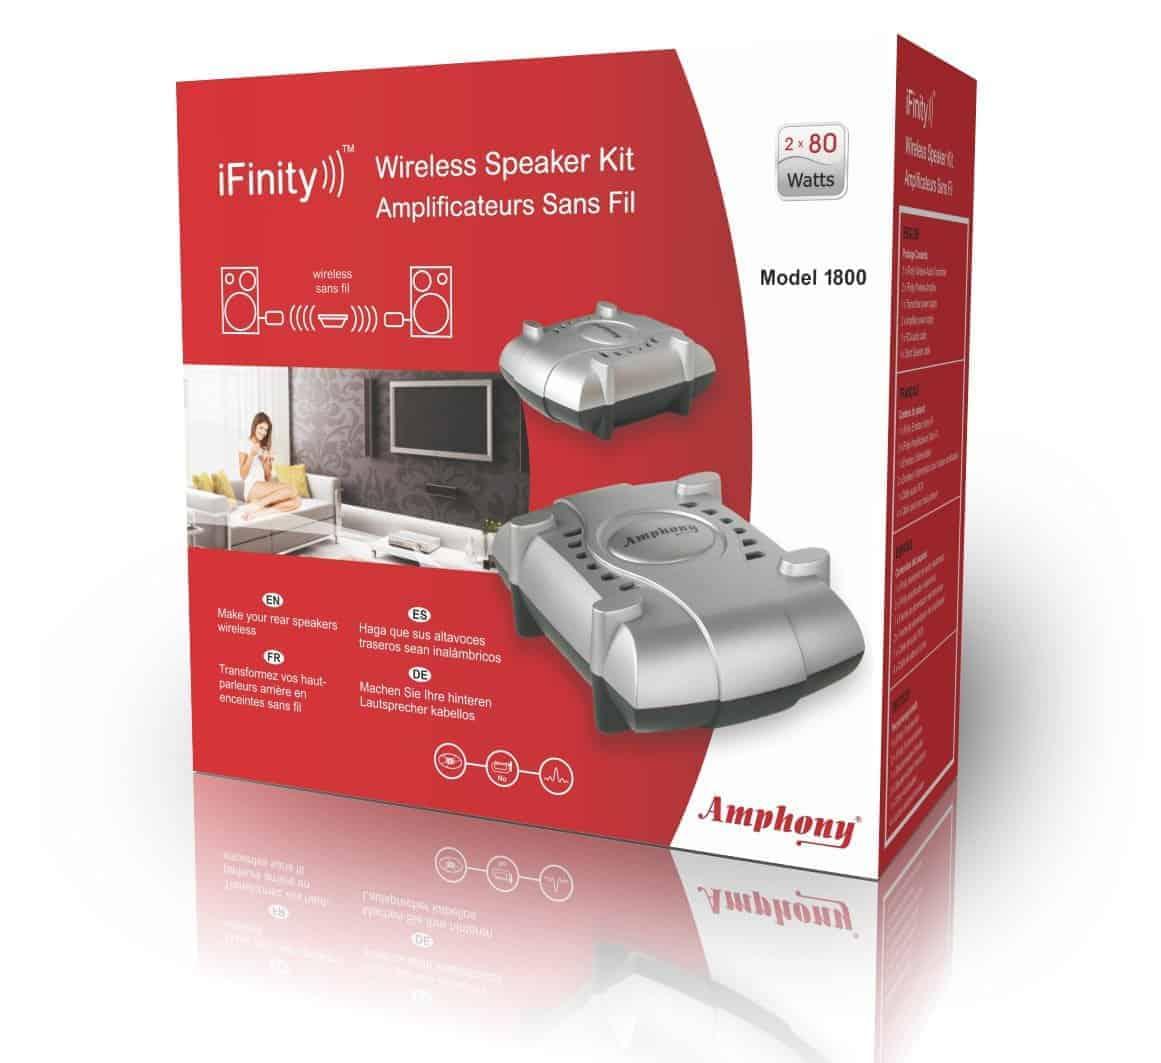 Amphony Wireless Surround Sound Speakers - Home Theatre